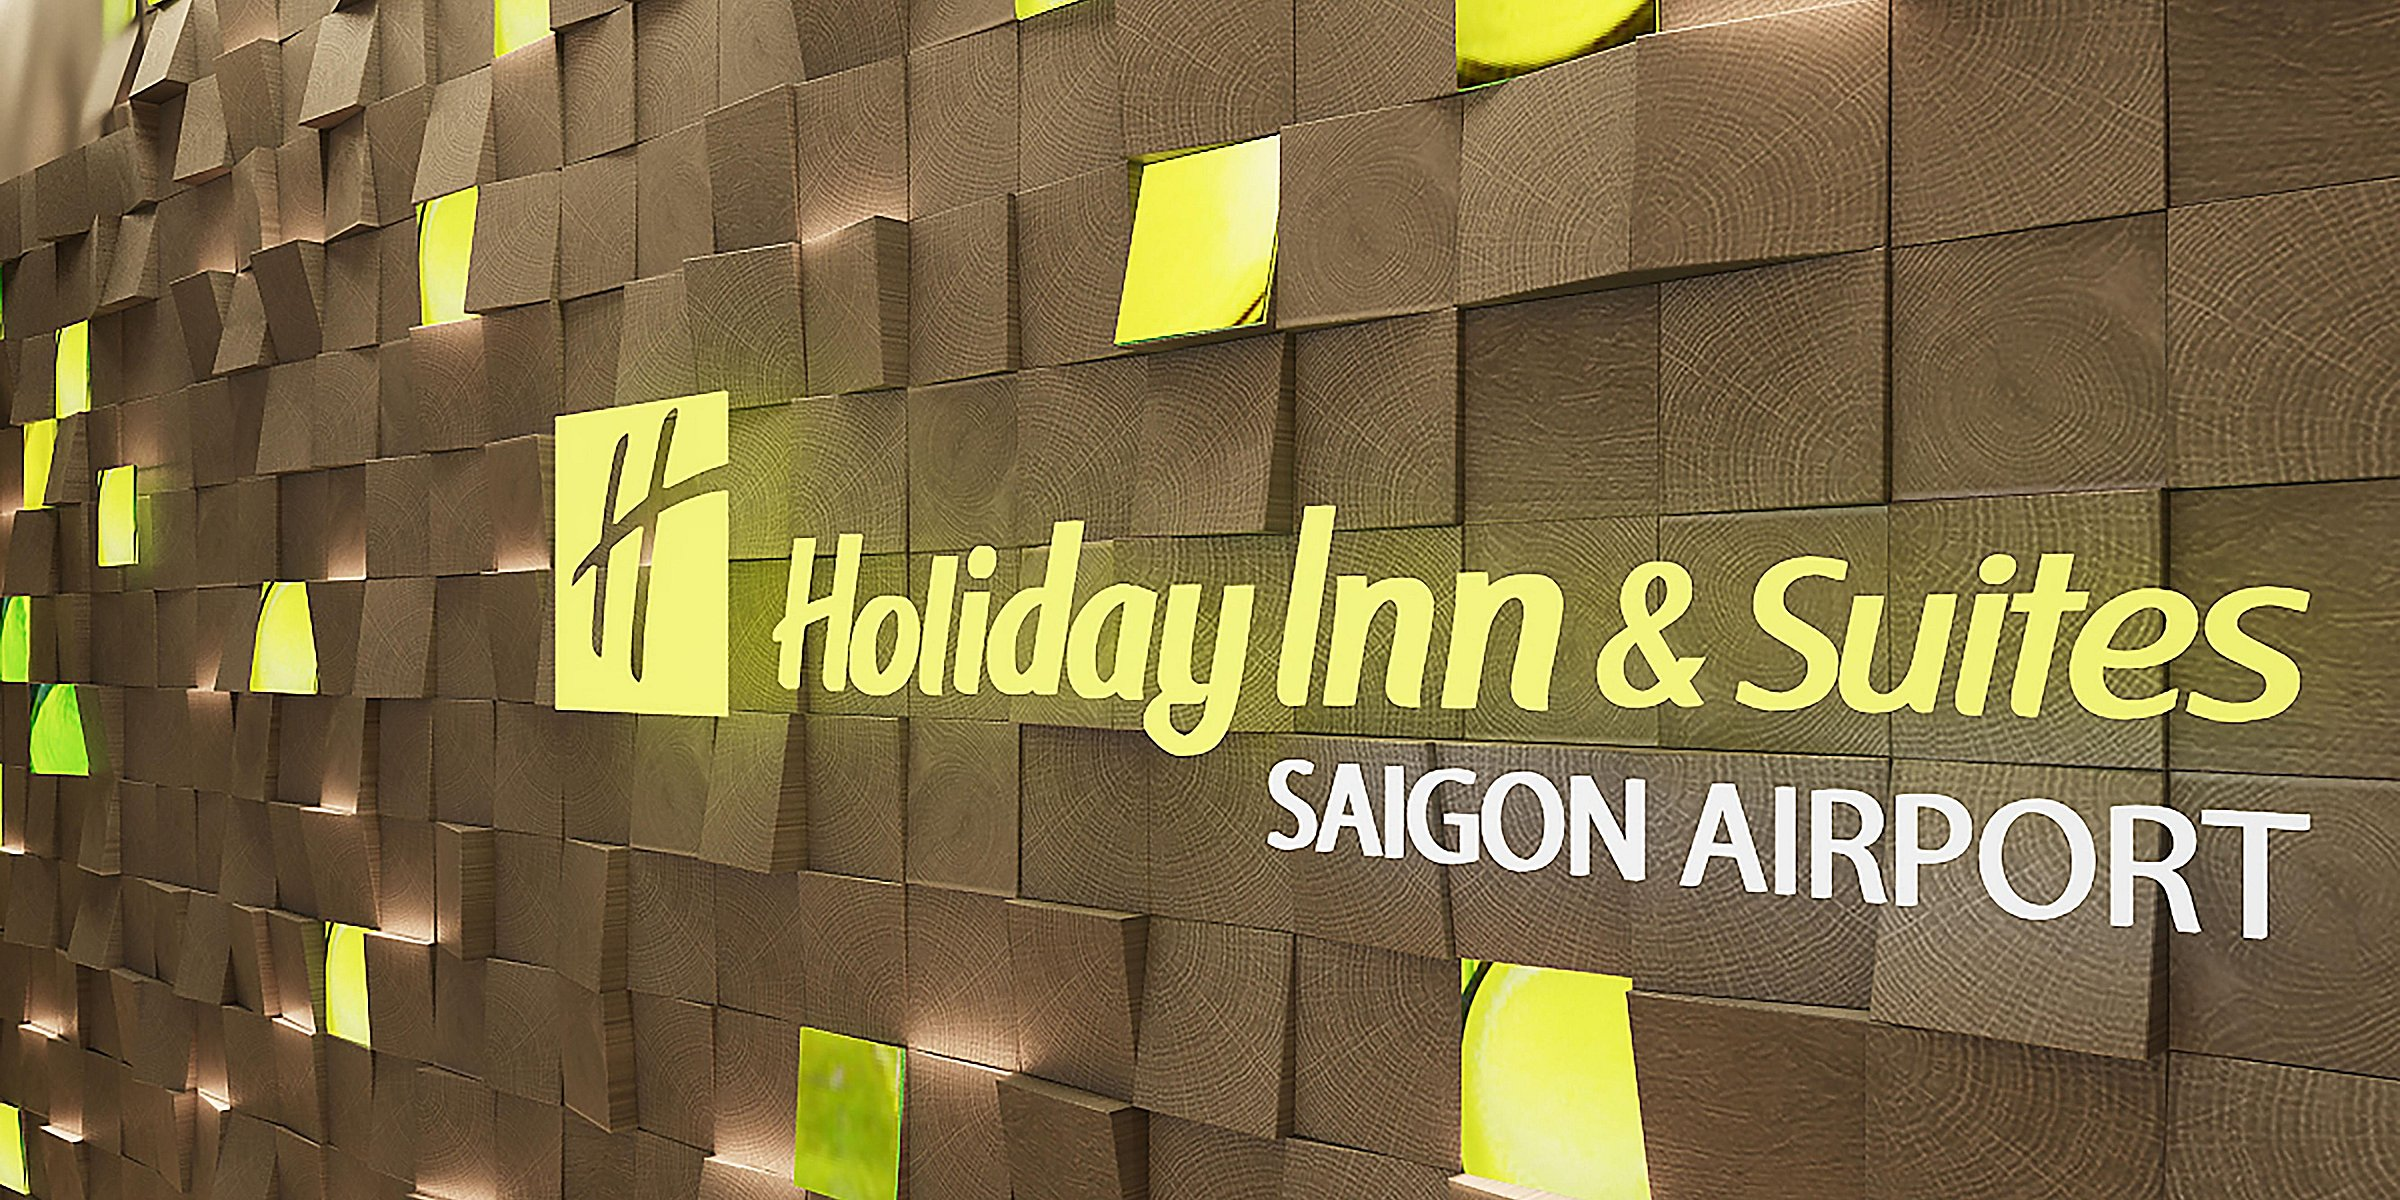 Holiday Inn Hotel & Suites Saigon Airport Hotel by IHG